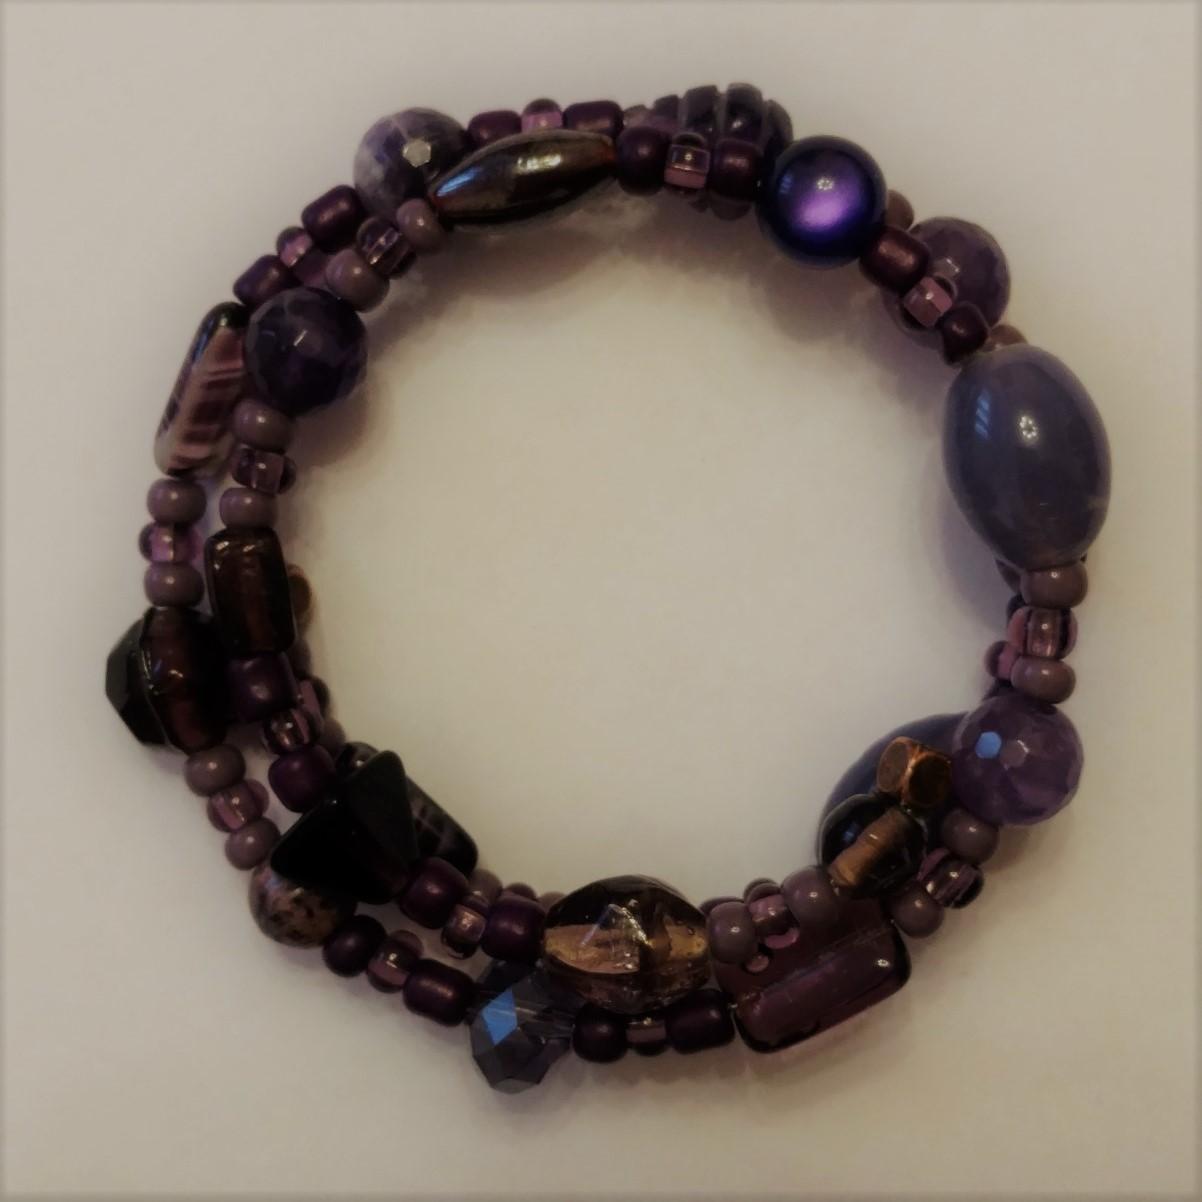 #L&L 181204 Bracelet  Suggested $18 USD - SOLD